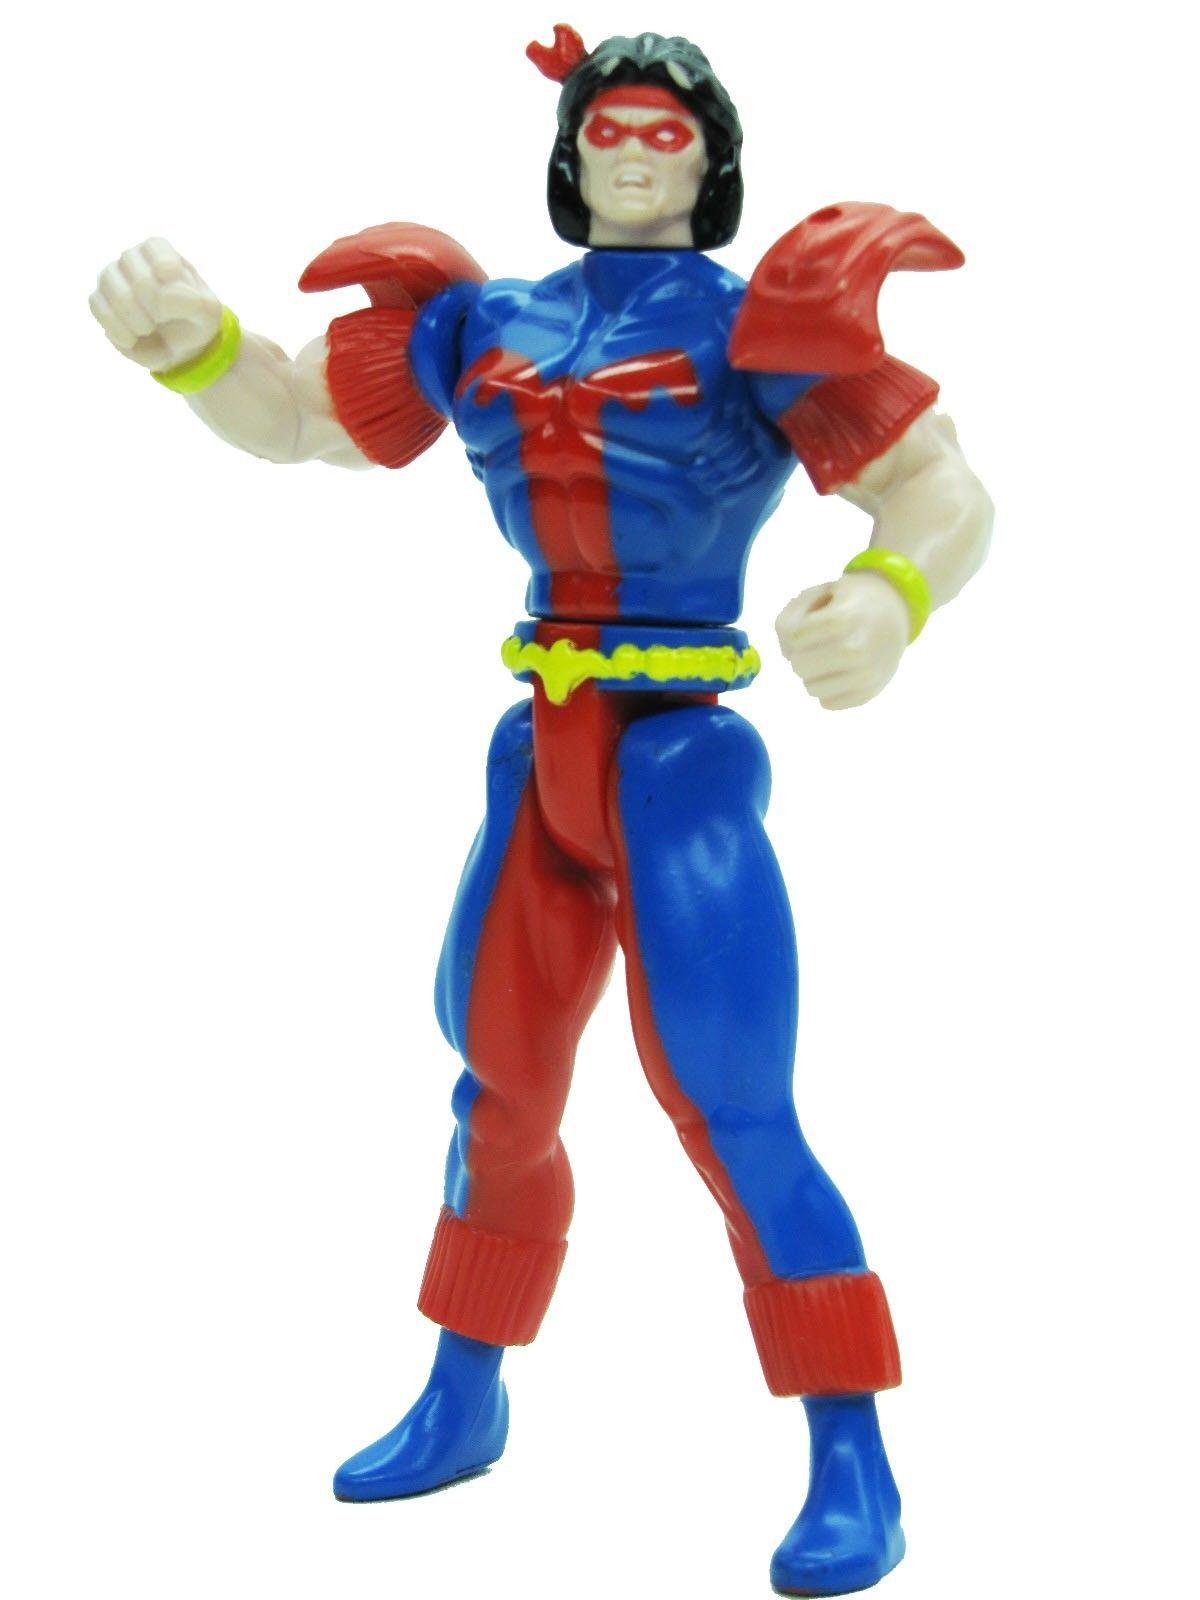 1992 Toy Biz The uncanny X Men X Force Warpath Action Figure VHTF Marvel